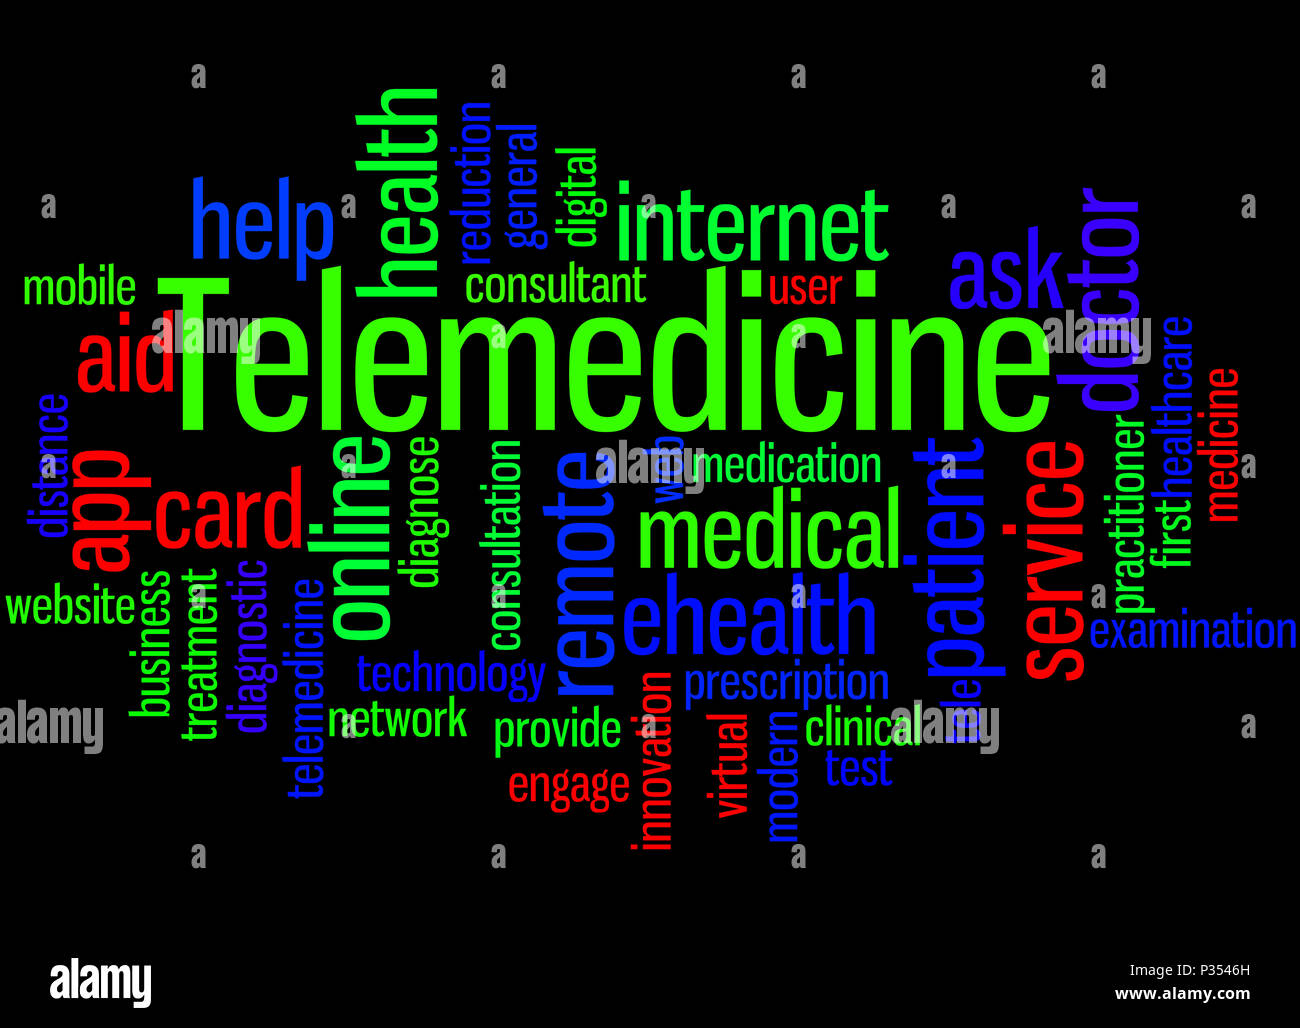 Telemedicine, word cloud concept on black background. - Stock Image